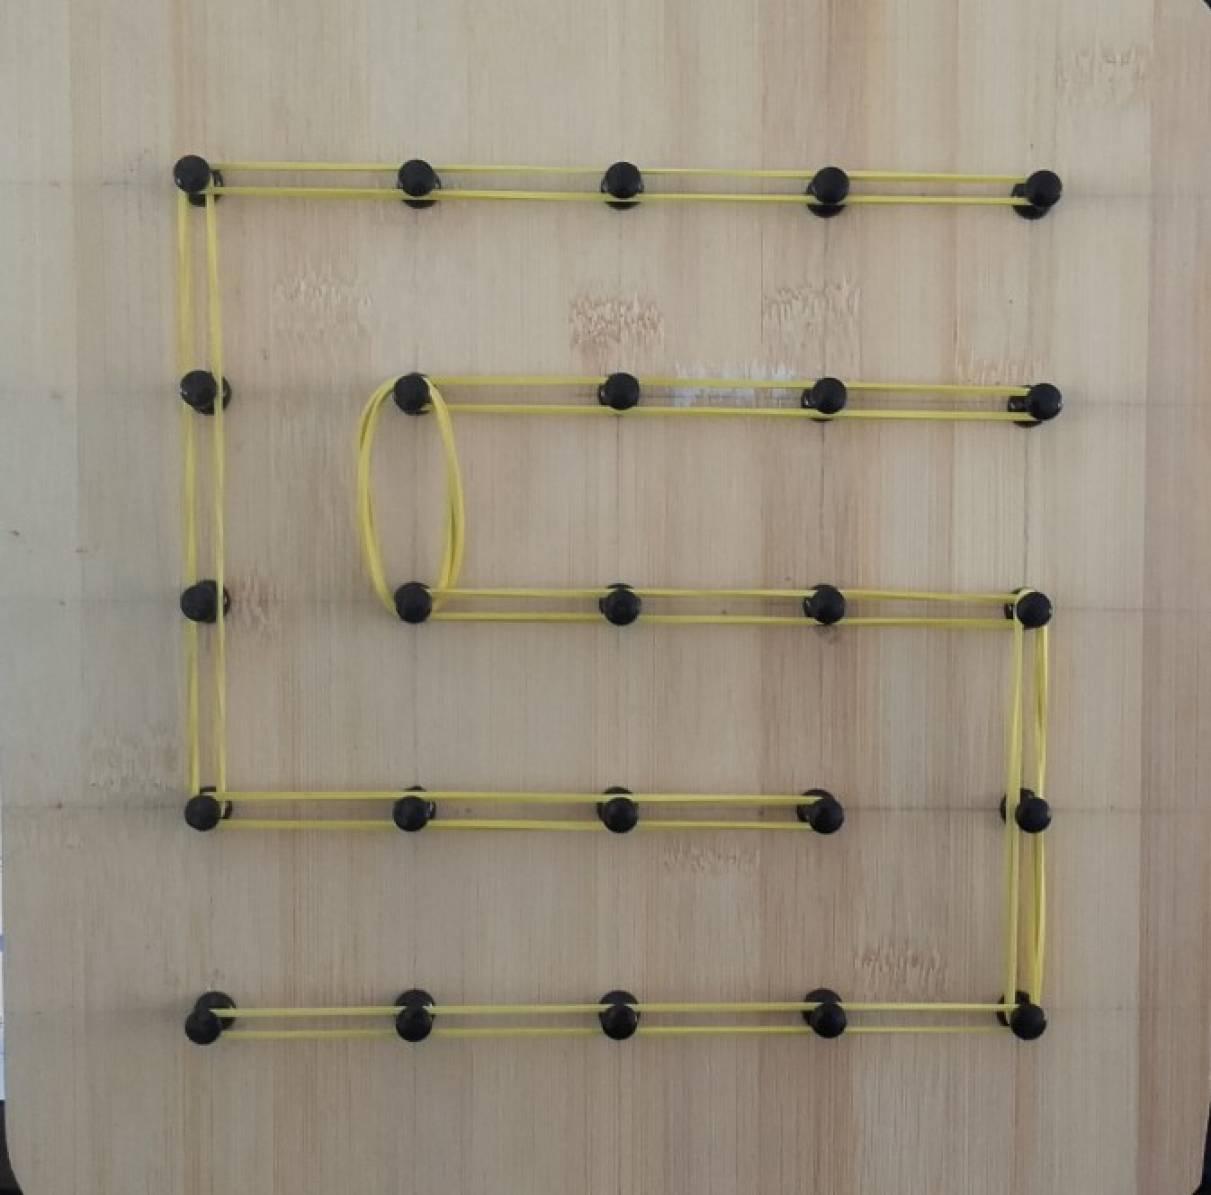 Математический планшет, или «Геометрик»